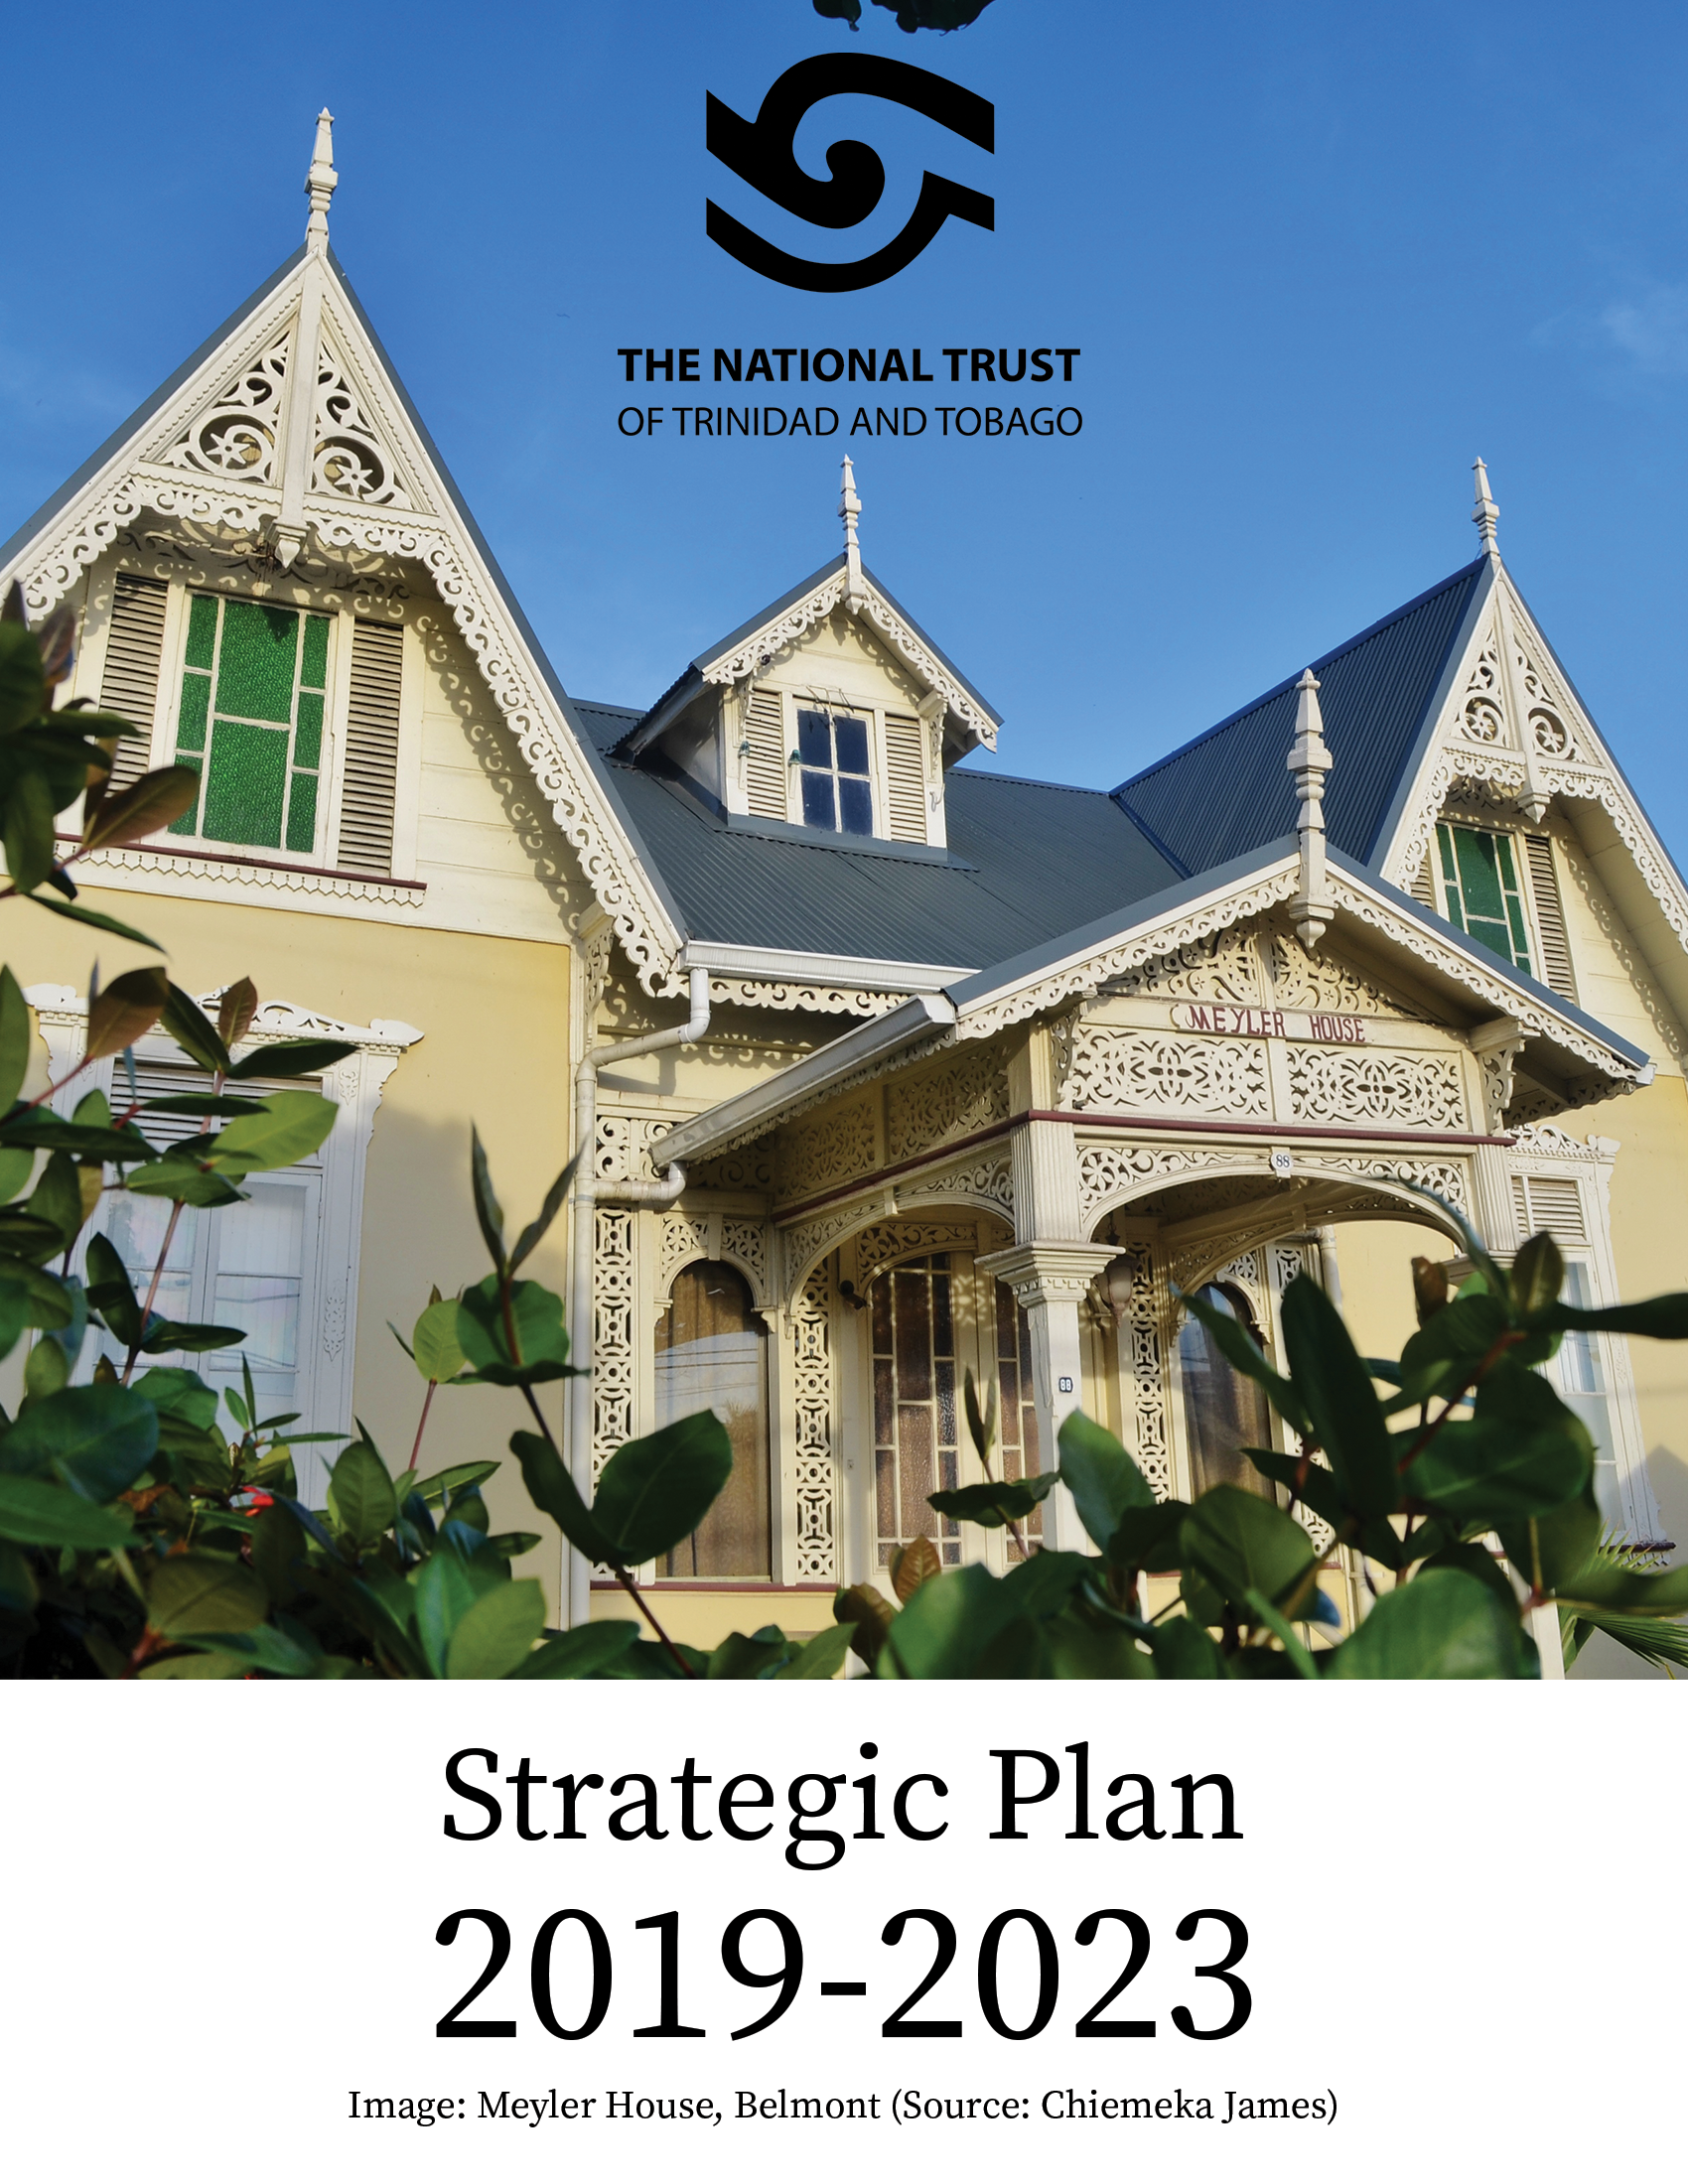 Strategic Plan 2019-2023